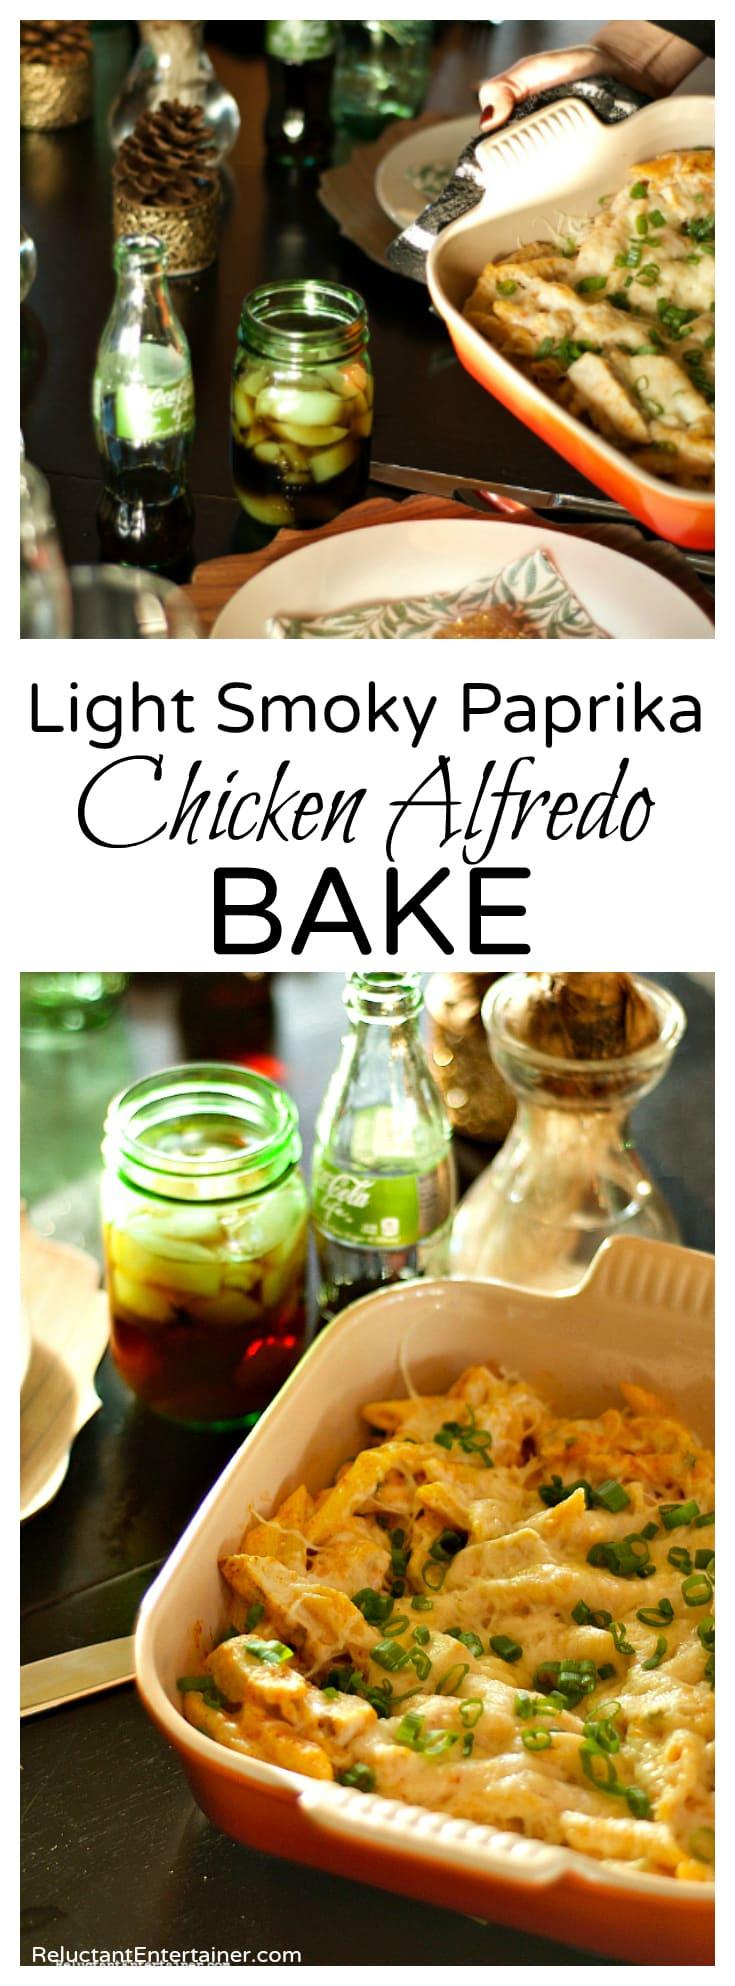 Light Smoky Paprika Chicken Alfredo Bake